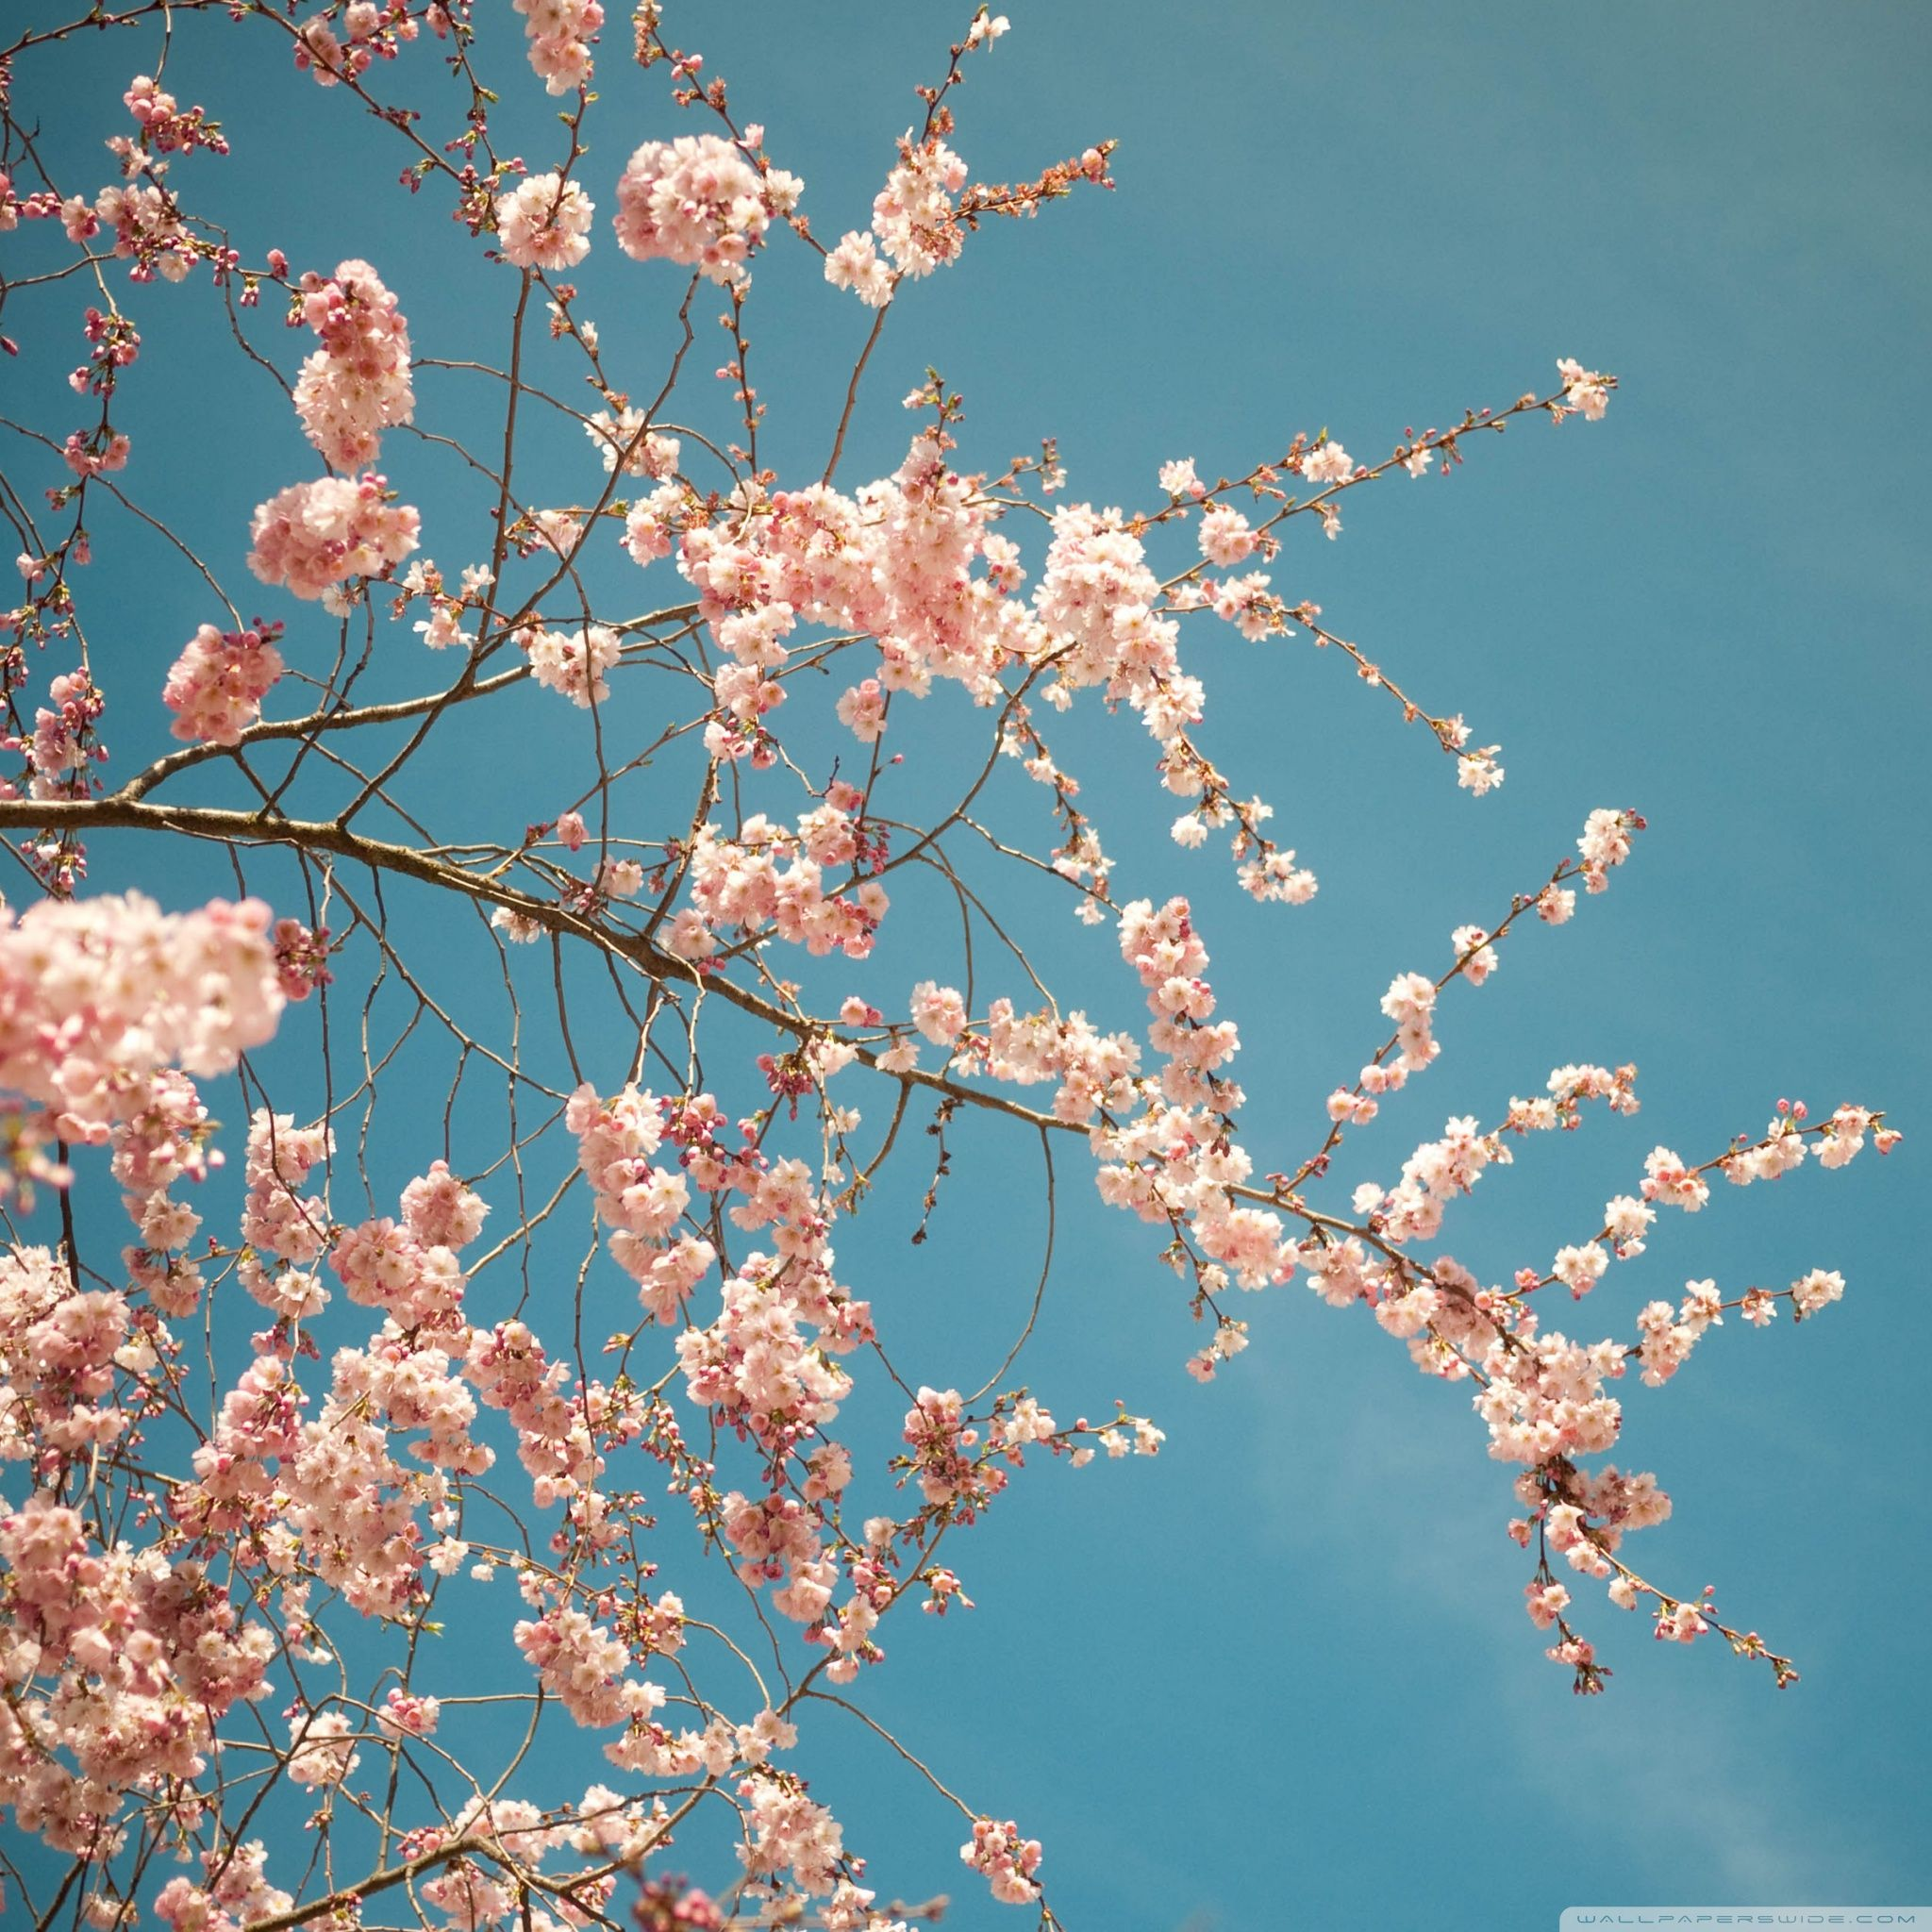 Spring Blossom Hd Desktop Wallpaper High Definition Fullscreen Blue Flower Wallpaper Cherry Blossom Pictures Beauty Wallpaper